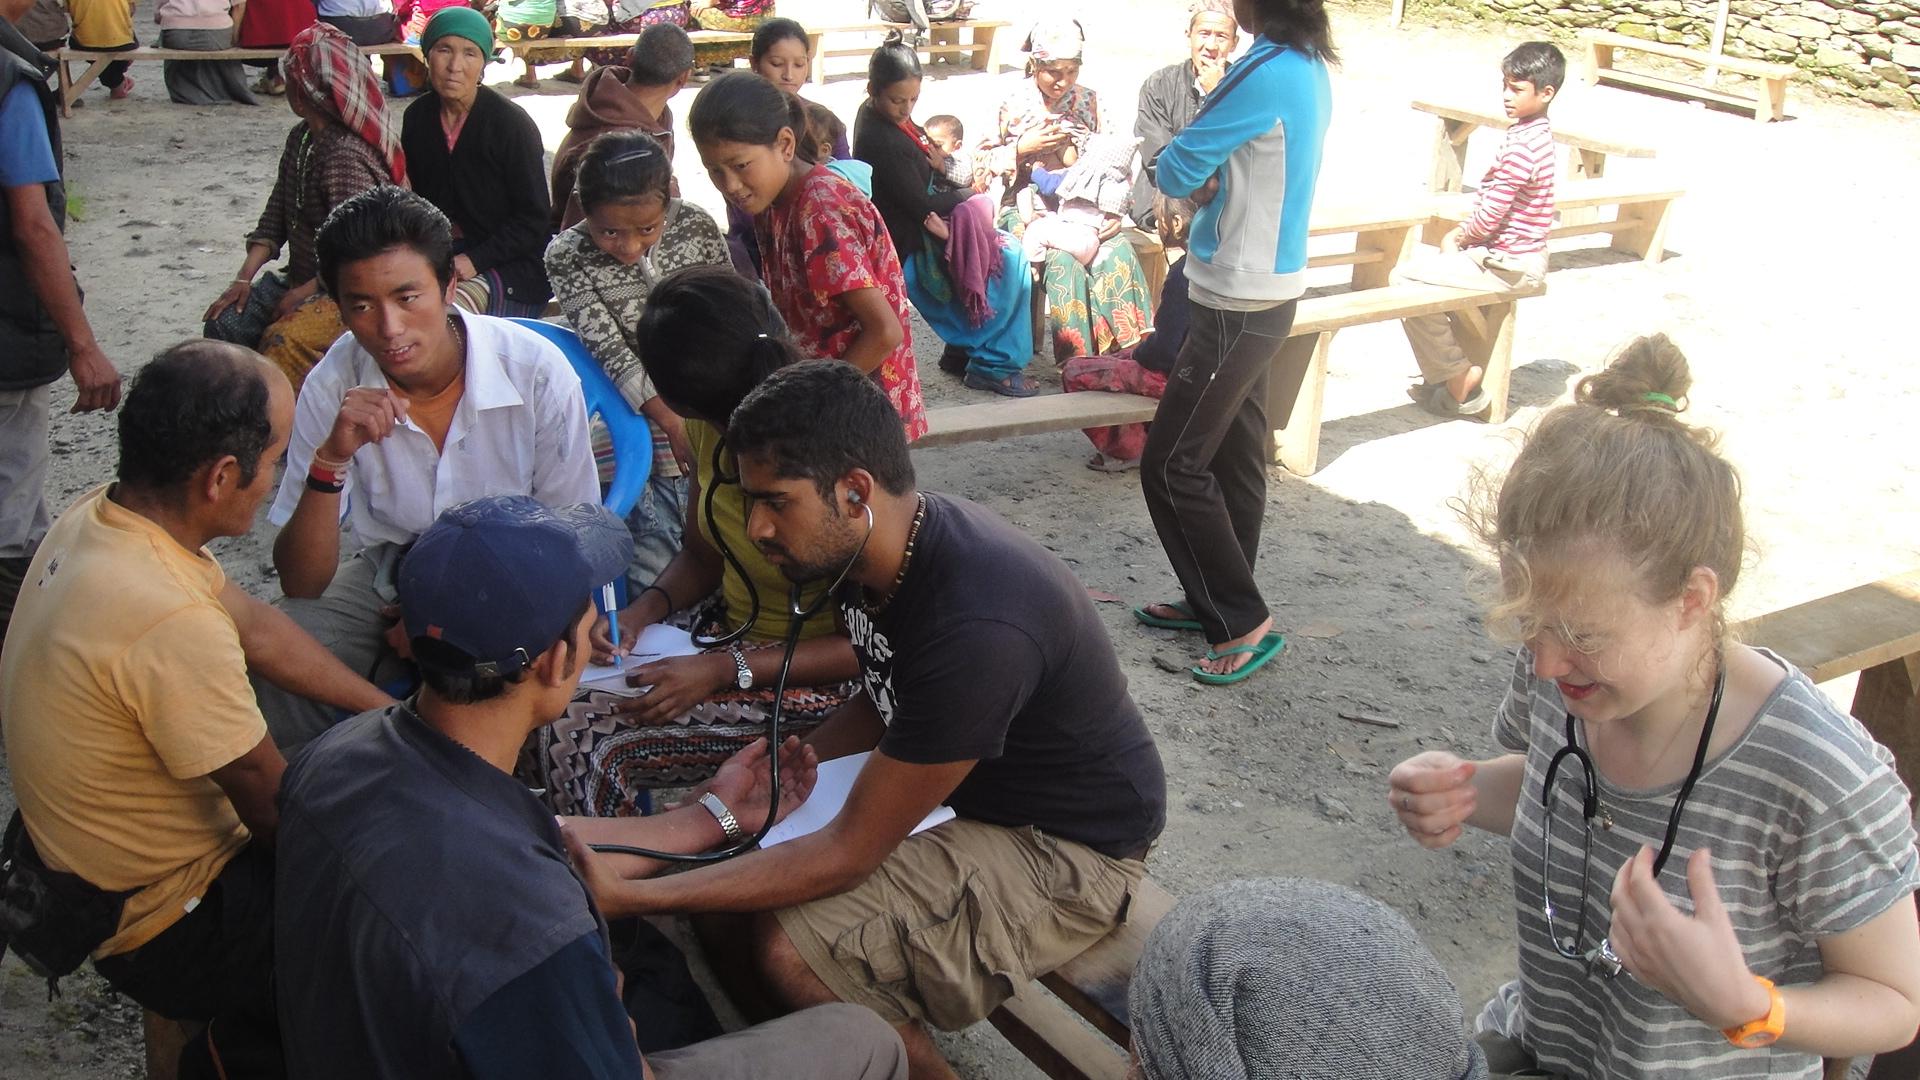 Village_Consultation_Medical_Students_Adventure_Alternative_Nepal.JPG